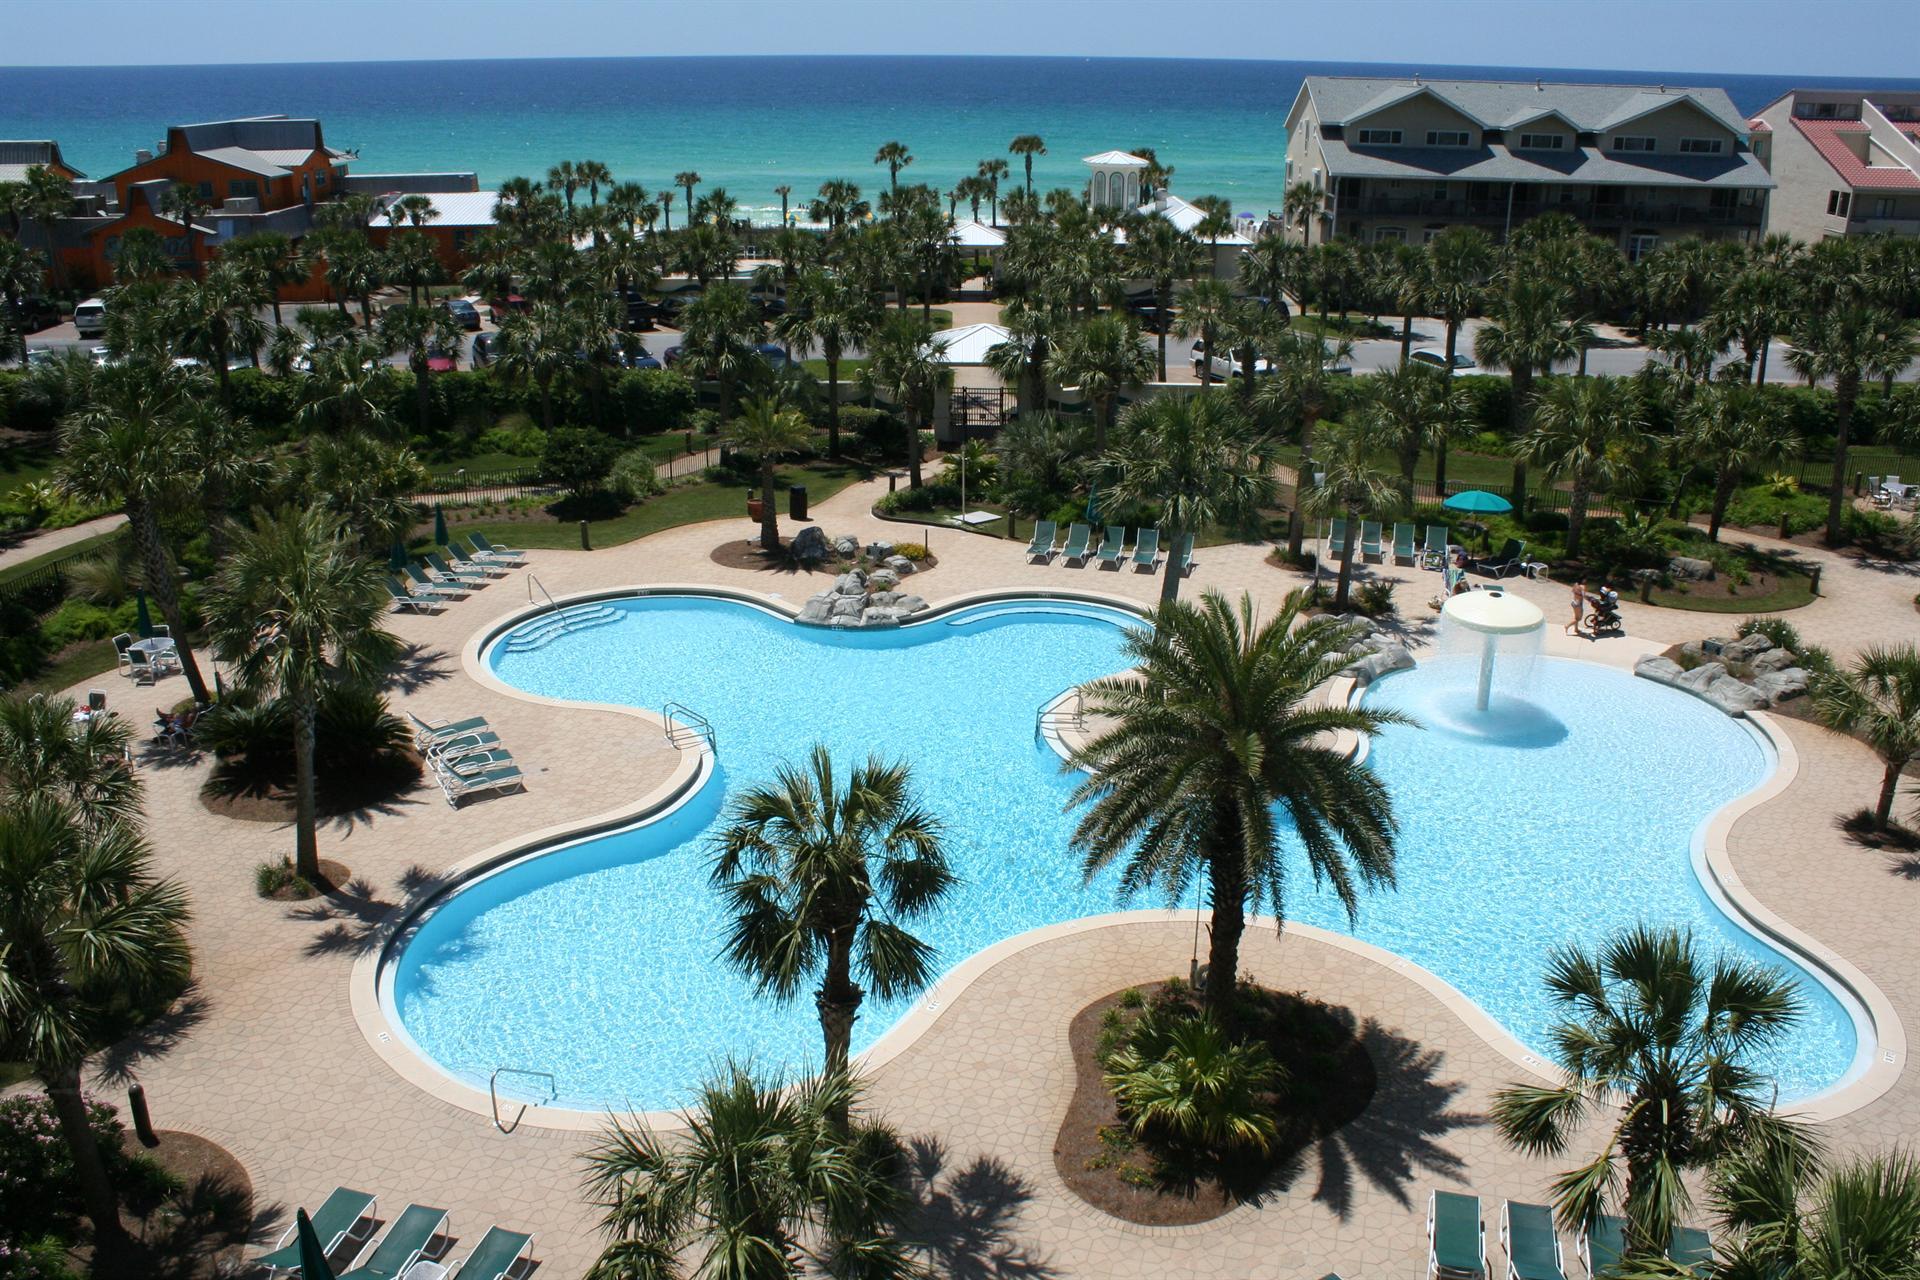 Pet Resort : Destin Florida Map Of Resorts - Map Of Hotels In Destin Florida